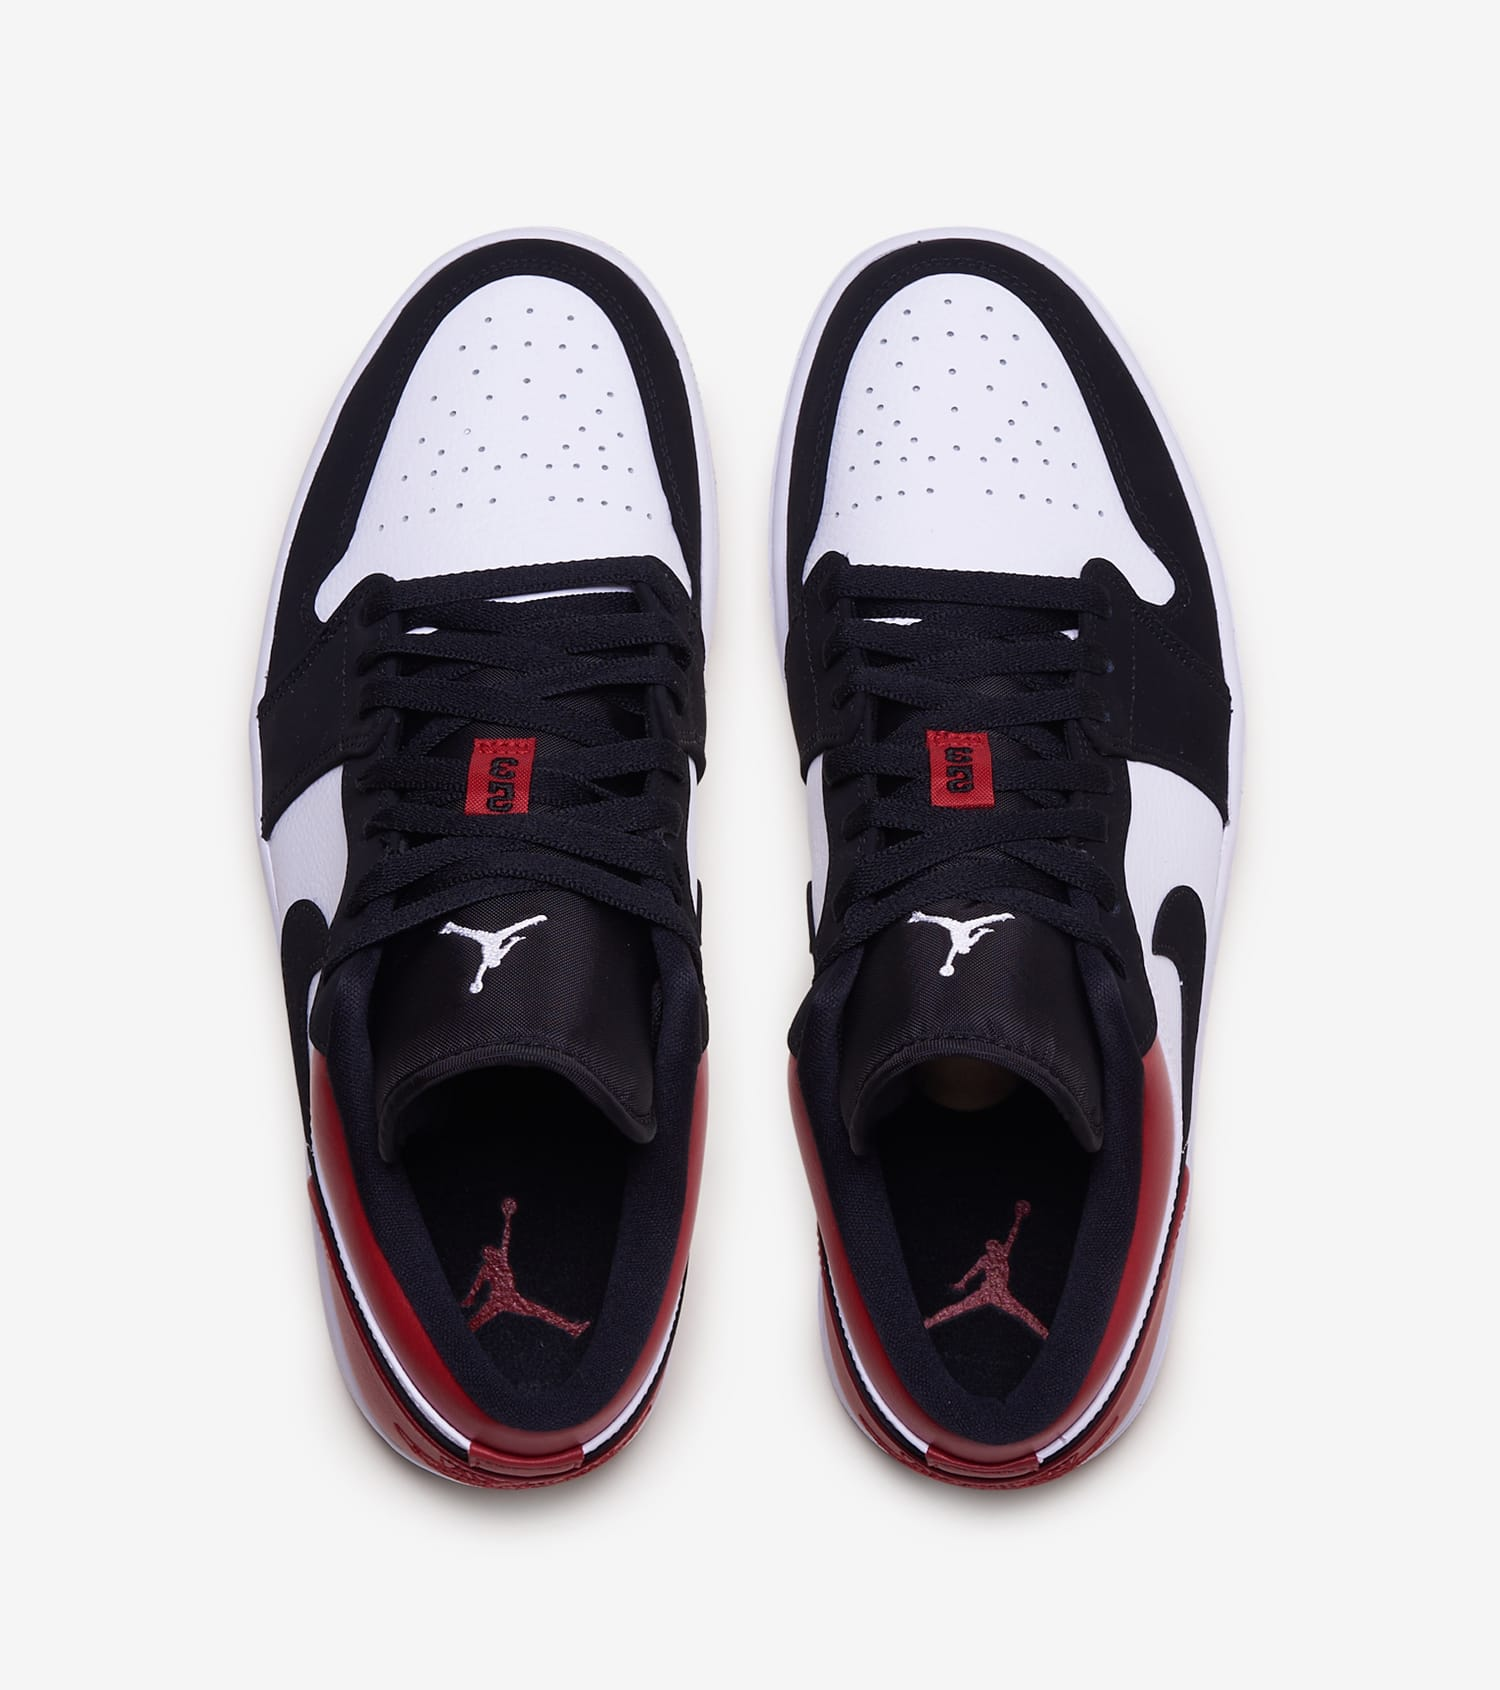 wholesale dealer f4fd3 57a1f Air Jordan 1 Low Black Toe